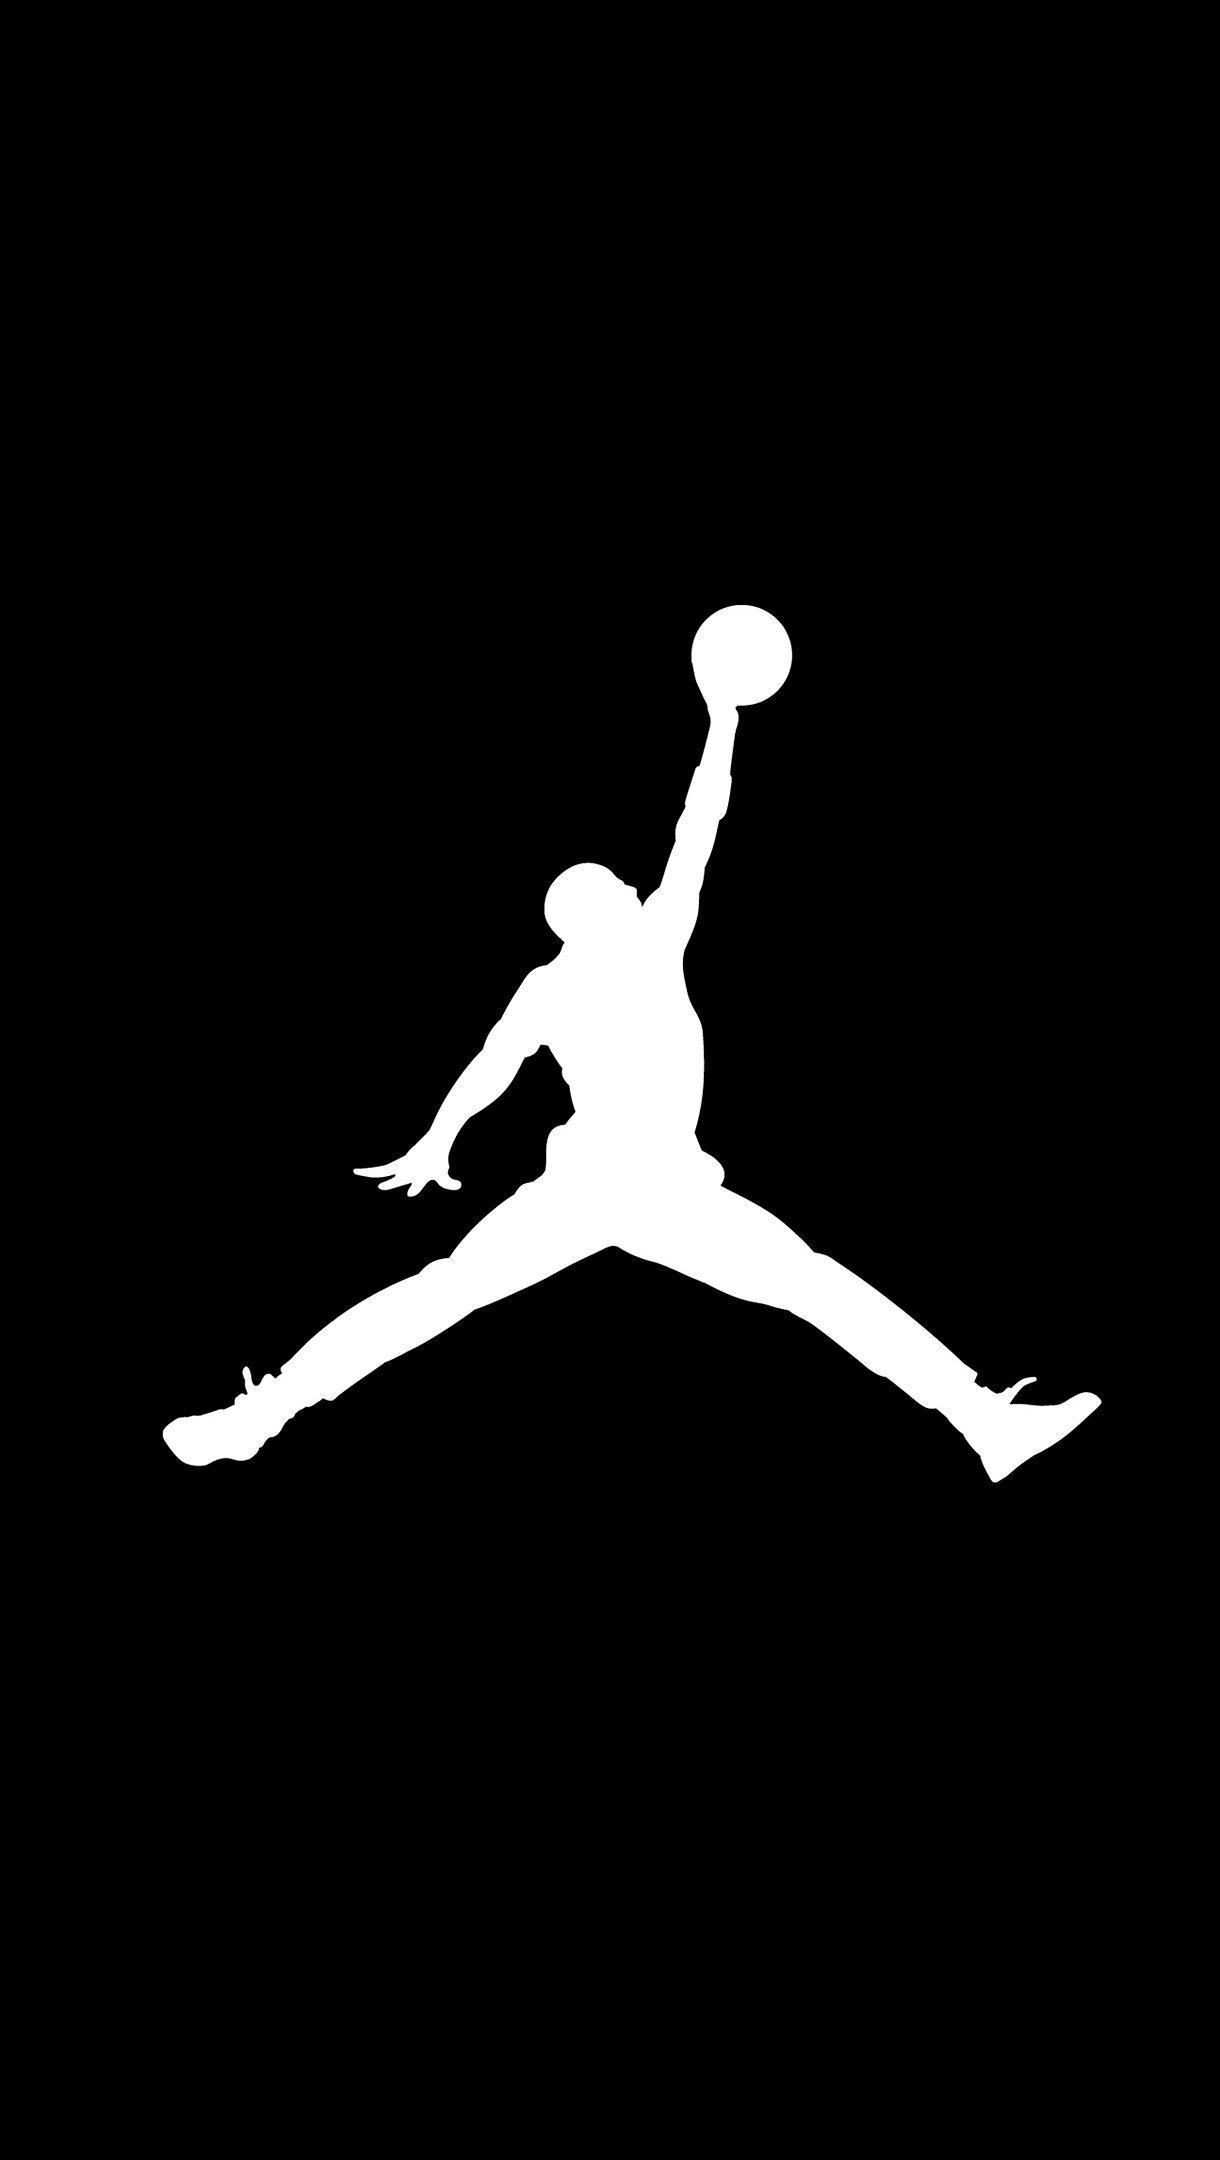 Fondos de pantalla Michael Jordan Logo Vertical